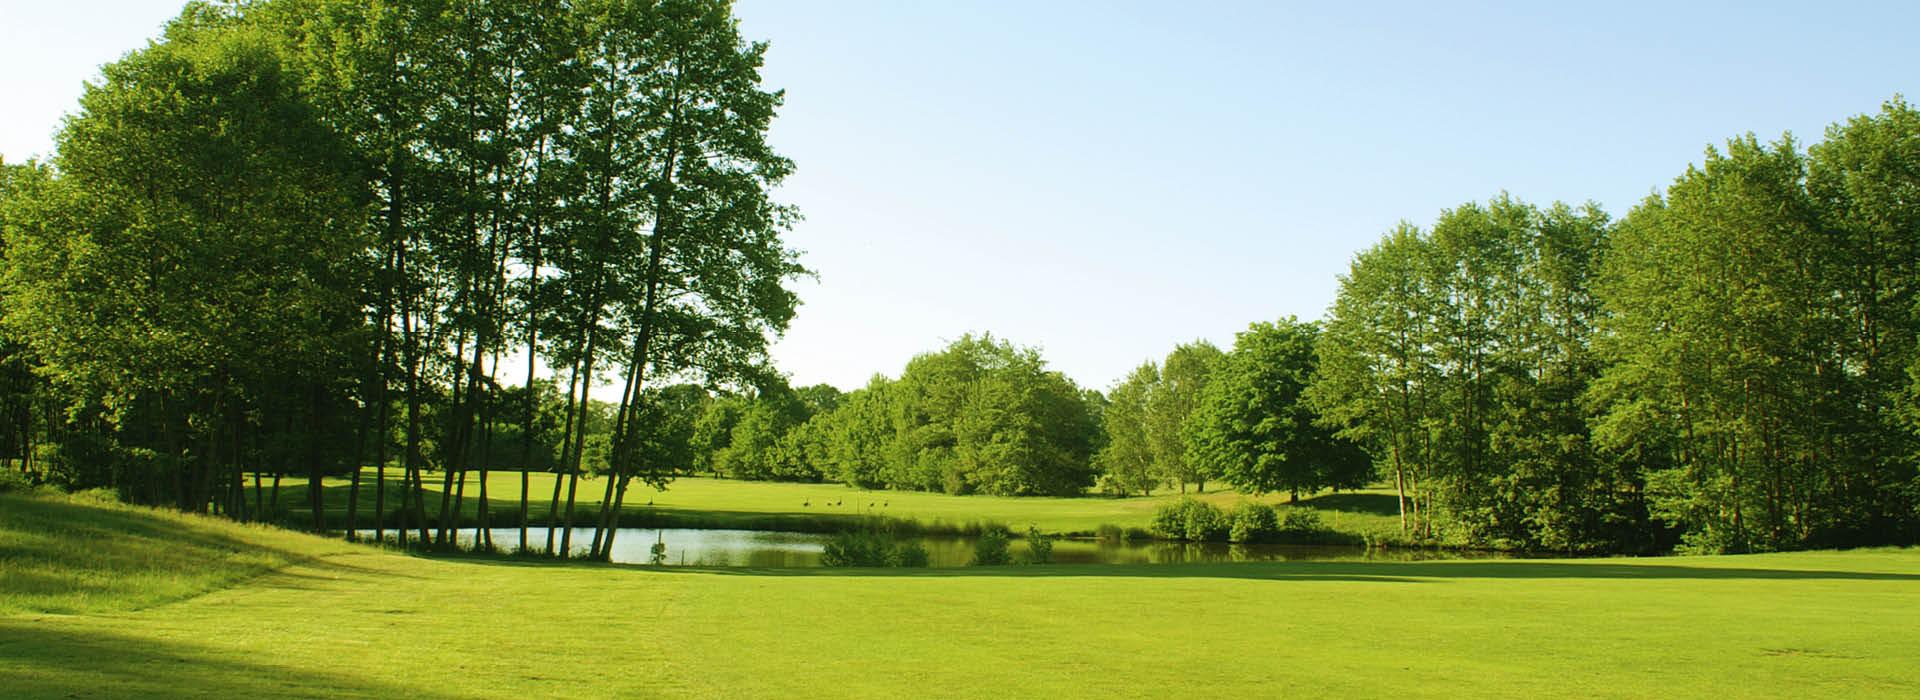 https://golfclub-peckeloh.de/wp-content/uploads/2021/02/GOPE21-073_Header_1920_x_700px3.jpg